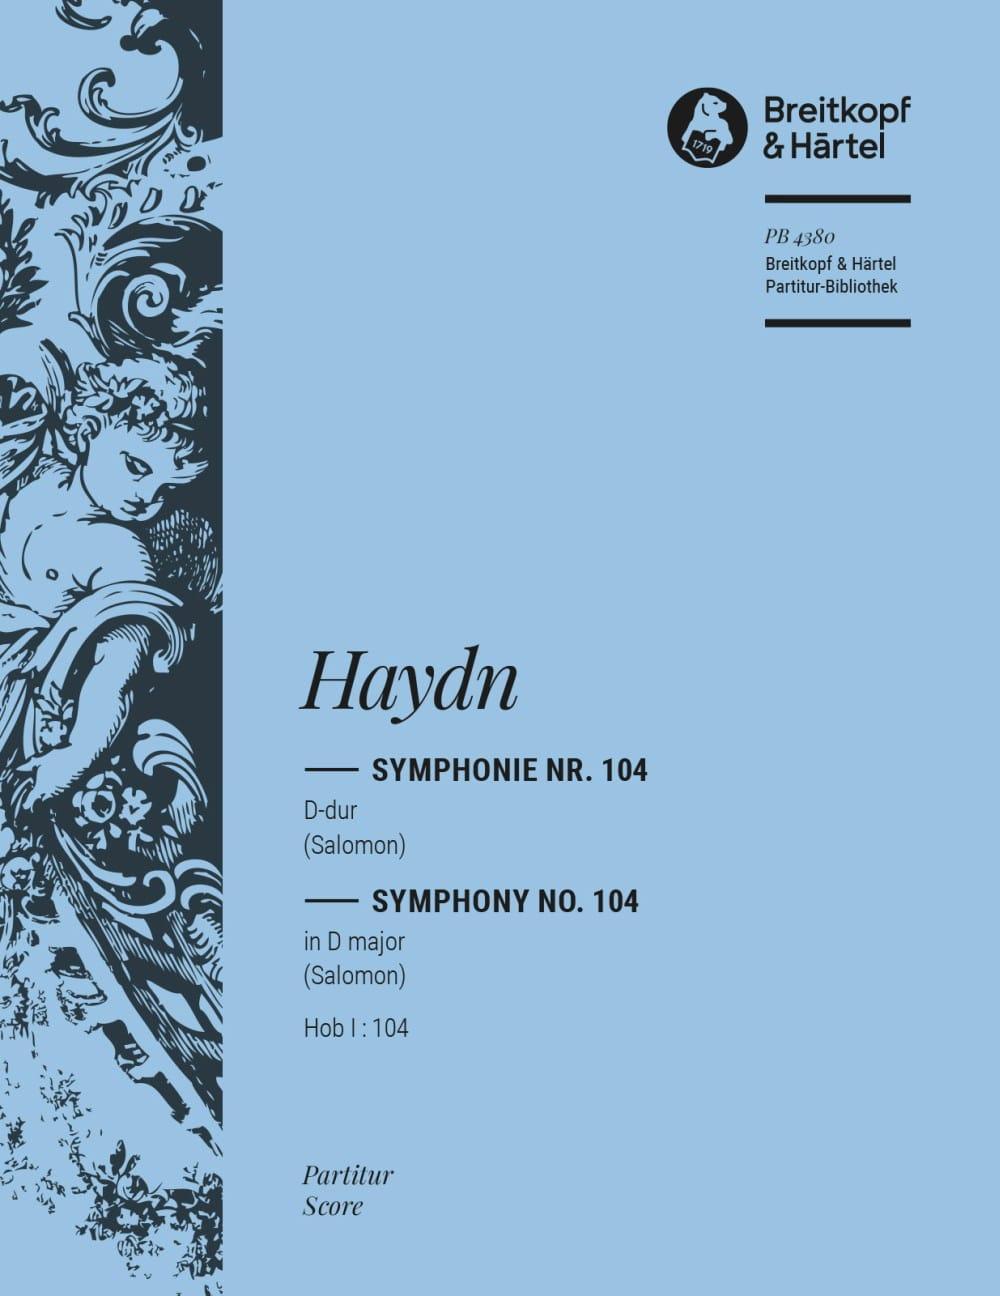 Symphonie D-Dur Hob 1 : 104 - Partitur - HAYDN - laflutedepan.com